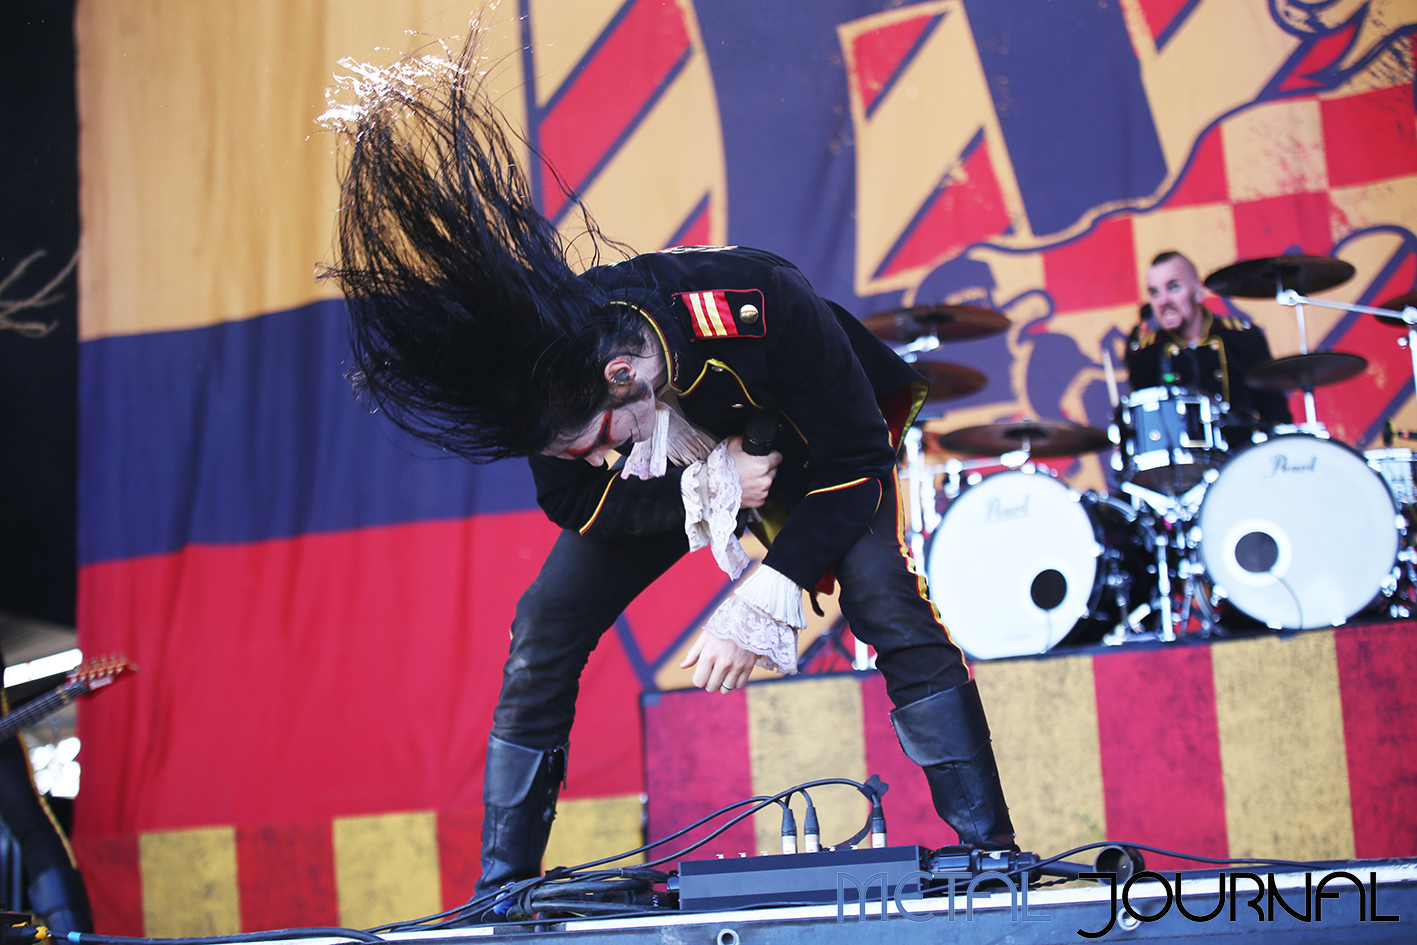 avatar - leyendas del rock 2019 metal journal pic 9